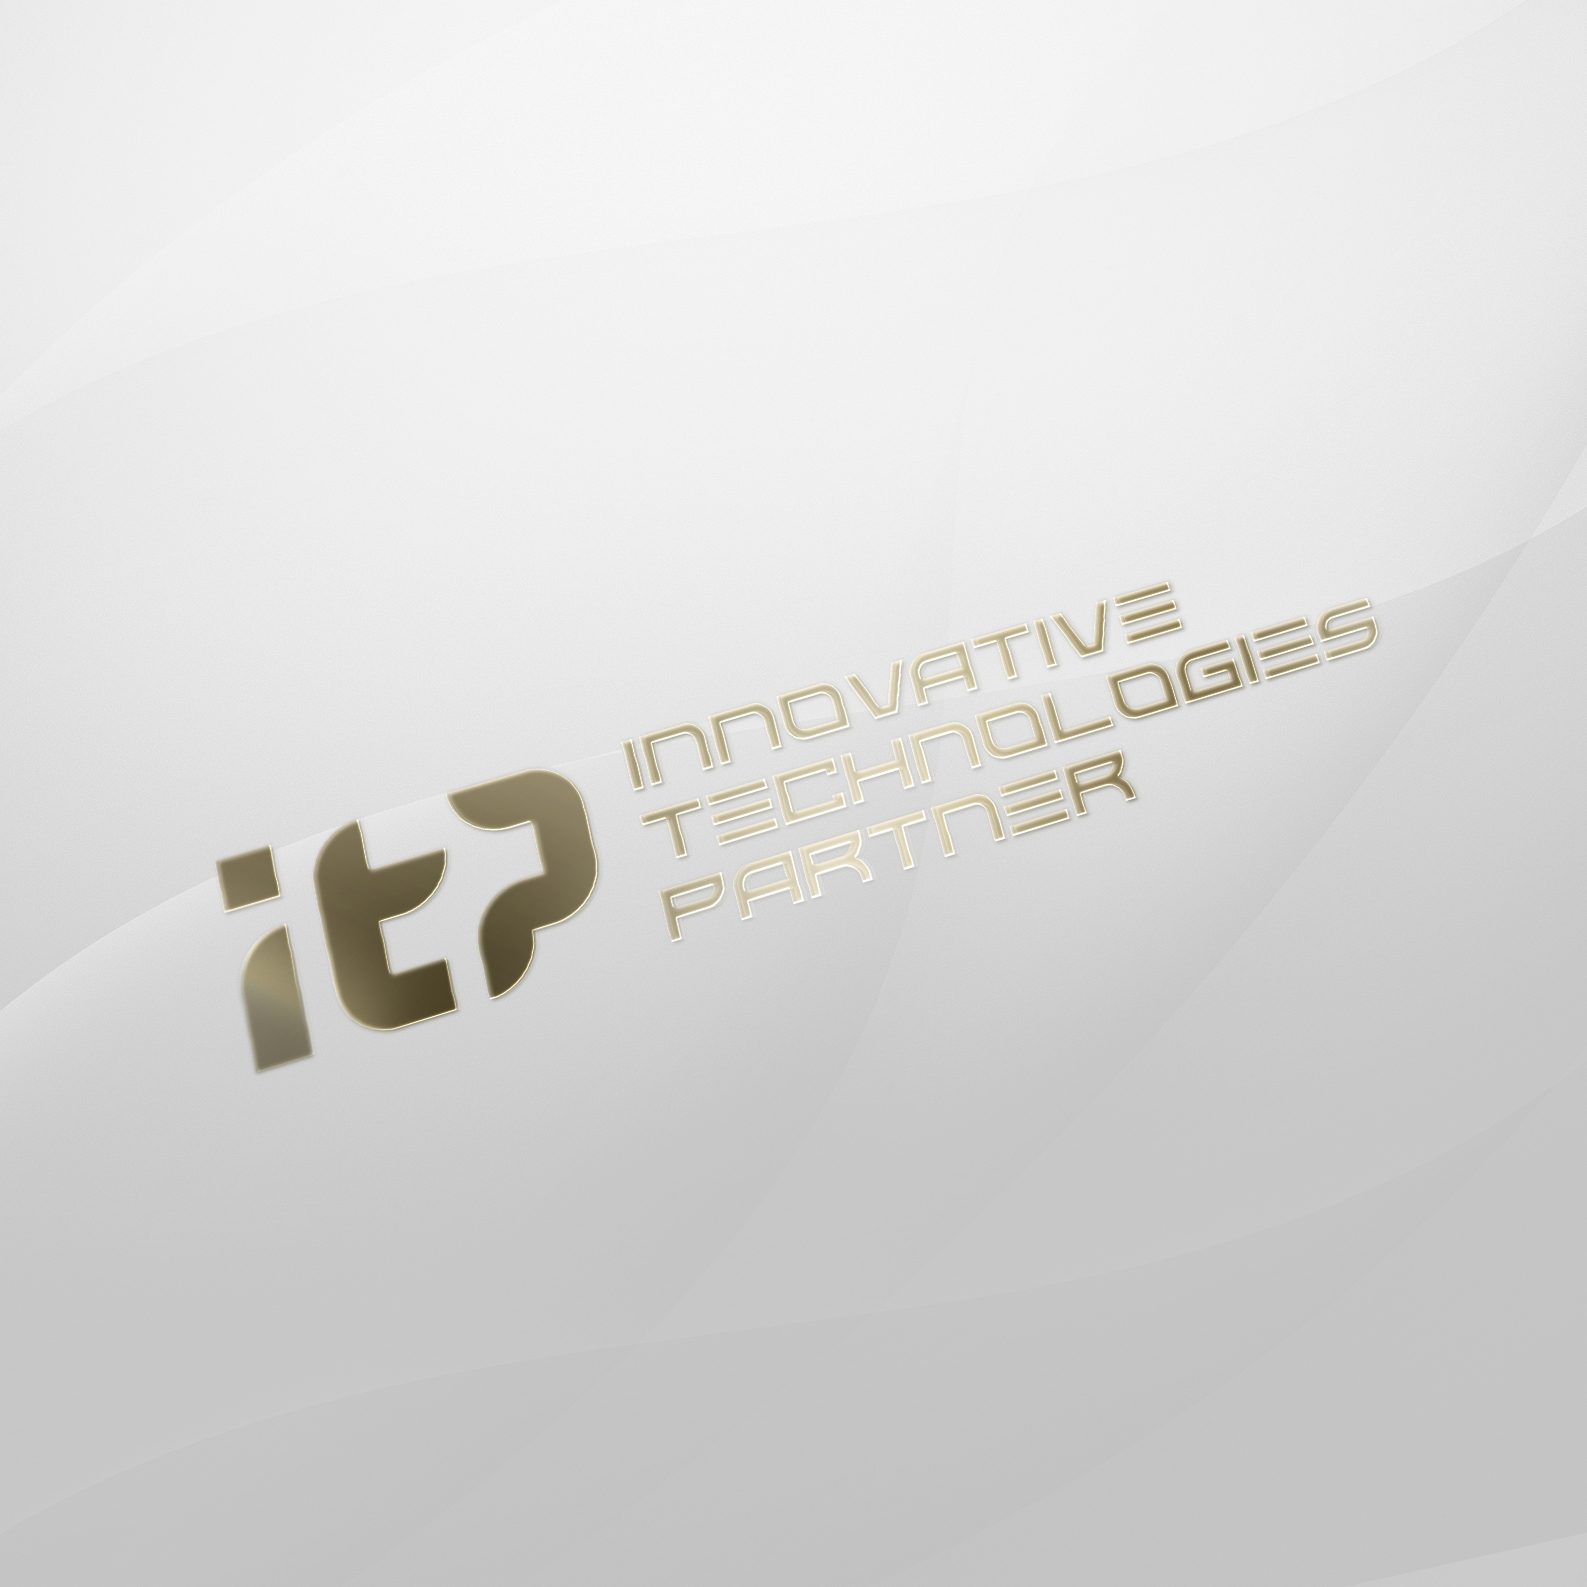 Innovative_Technologies_Partner_logo_blue_02d